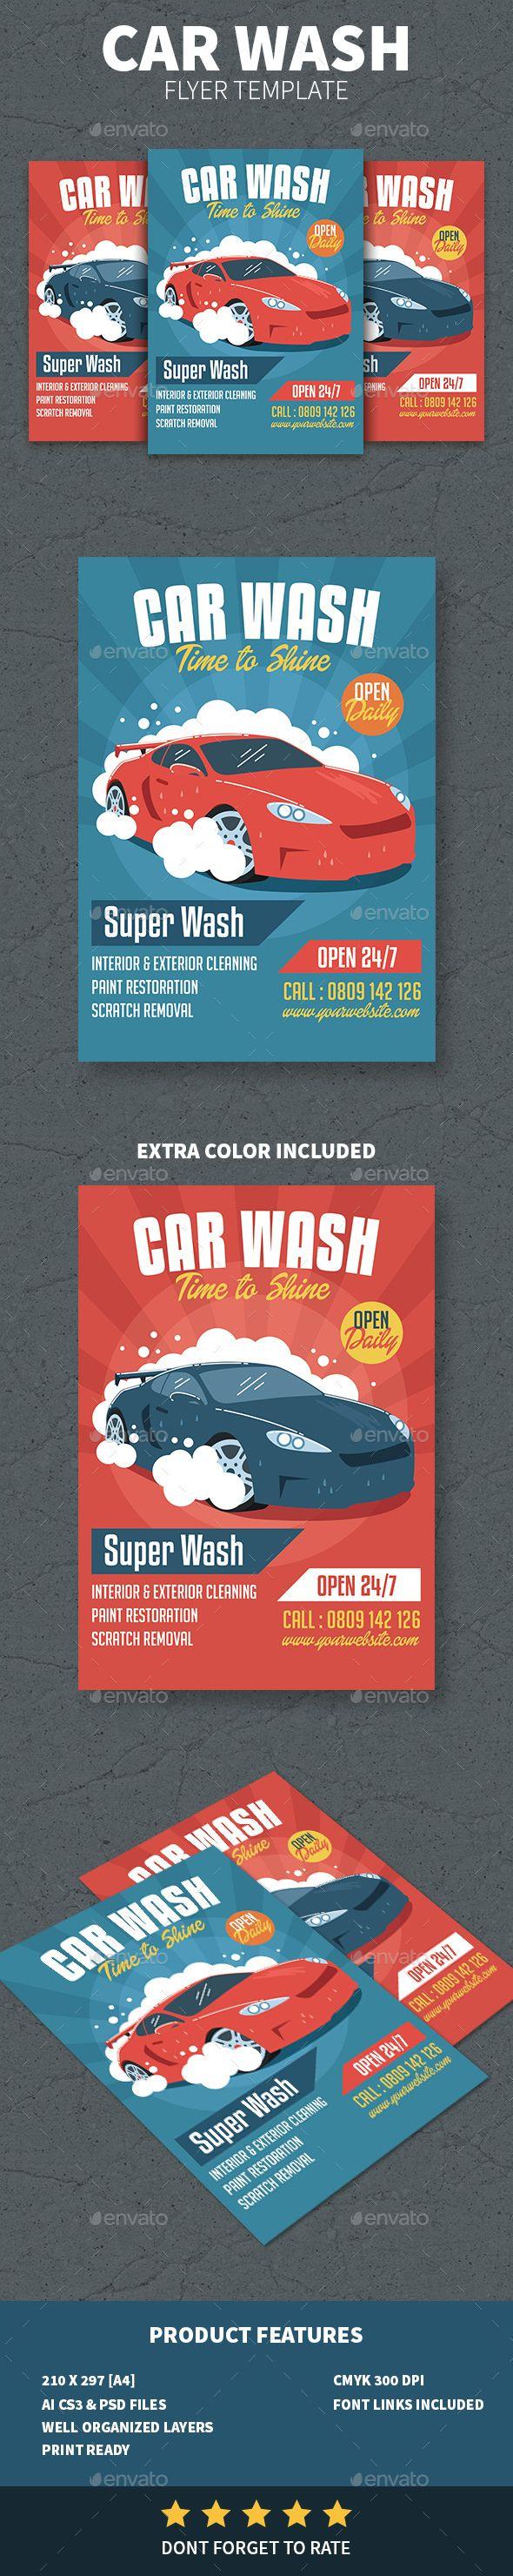 Car Wash Flyer Template PSD, AI Illustrator